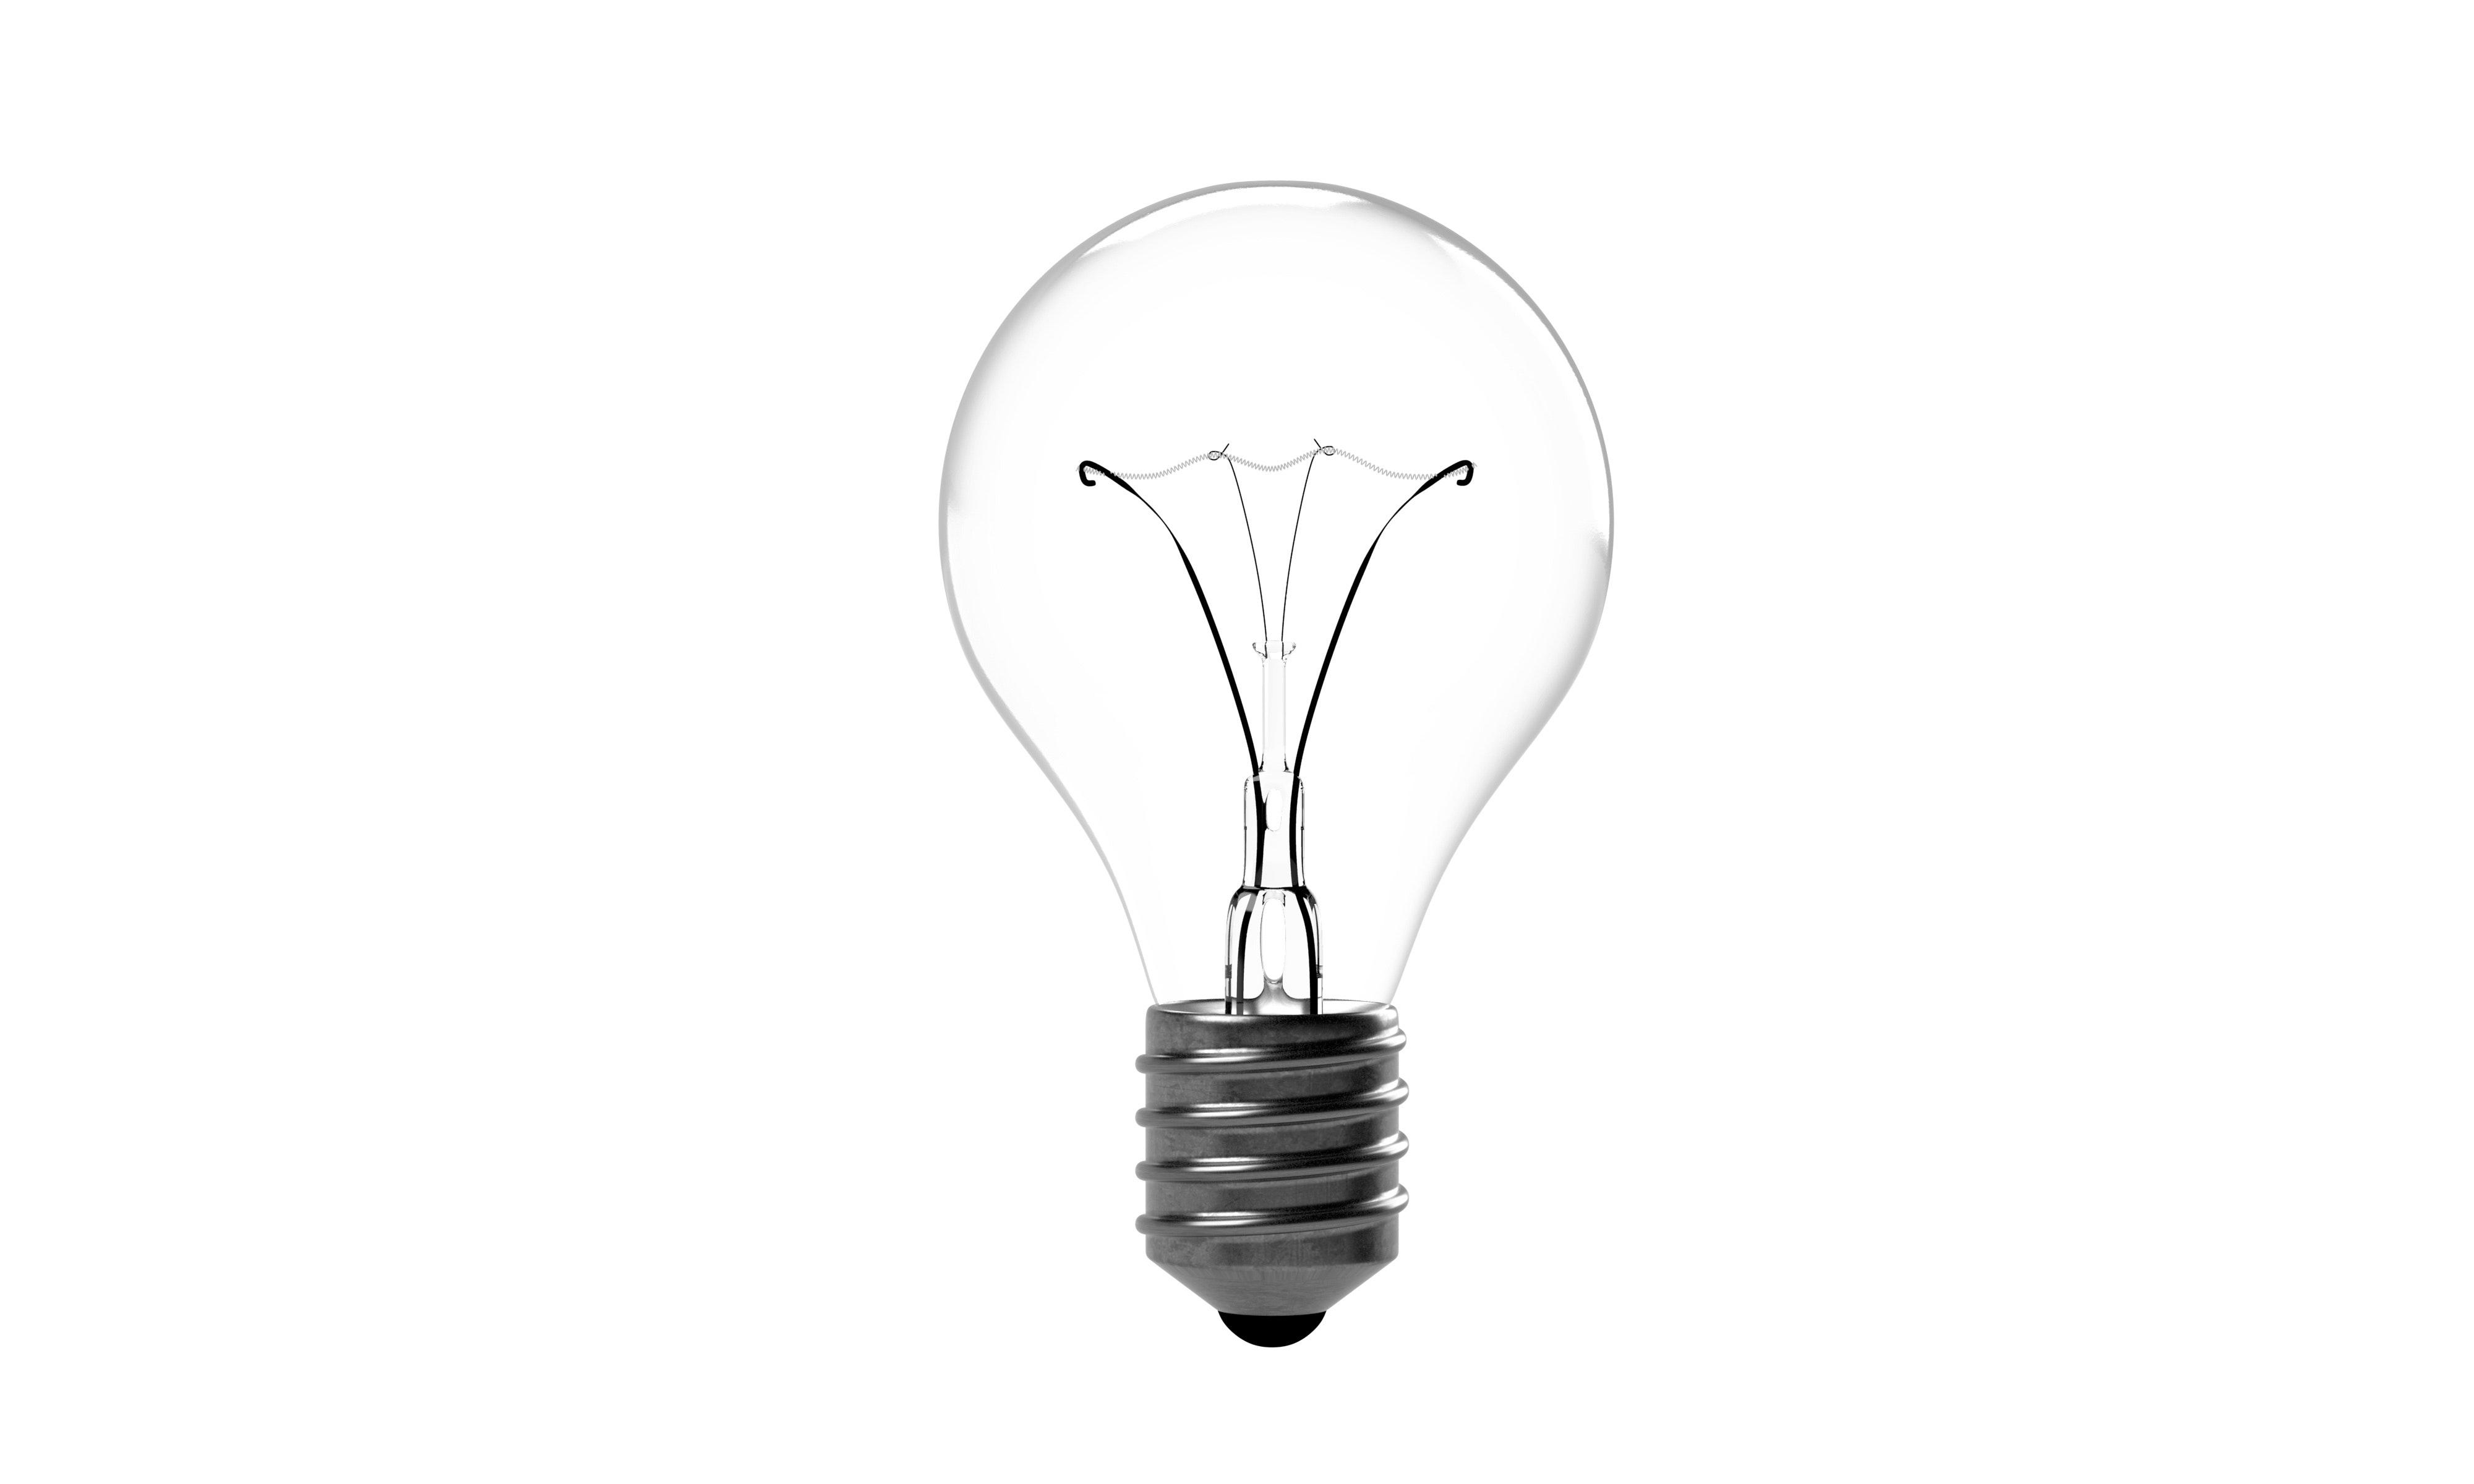 bright-energy-idea-247753